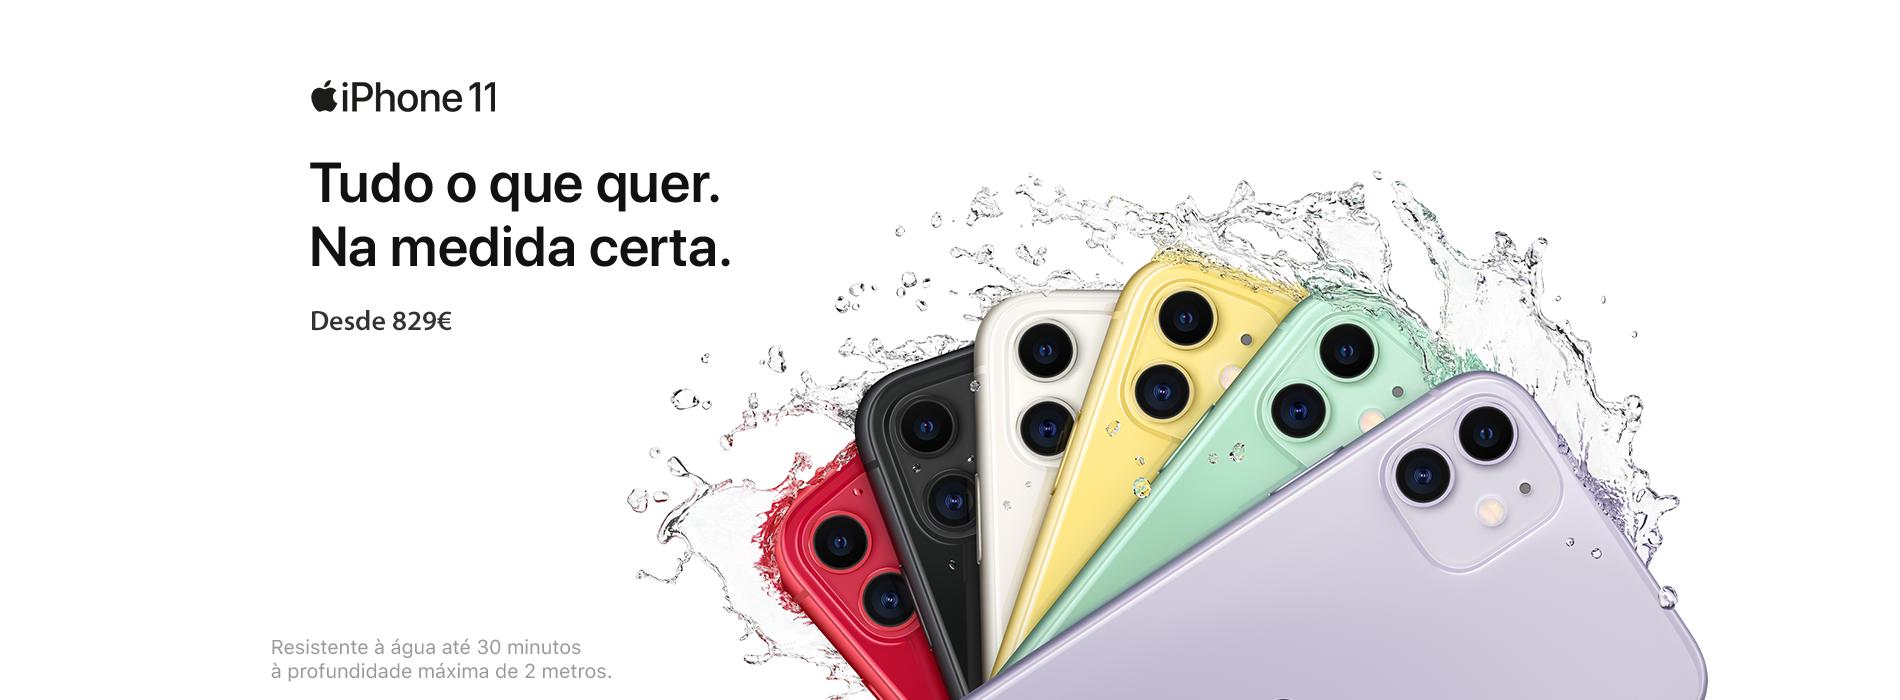 Homepage Slideshow - iPhone 11